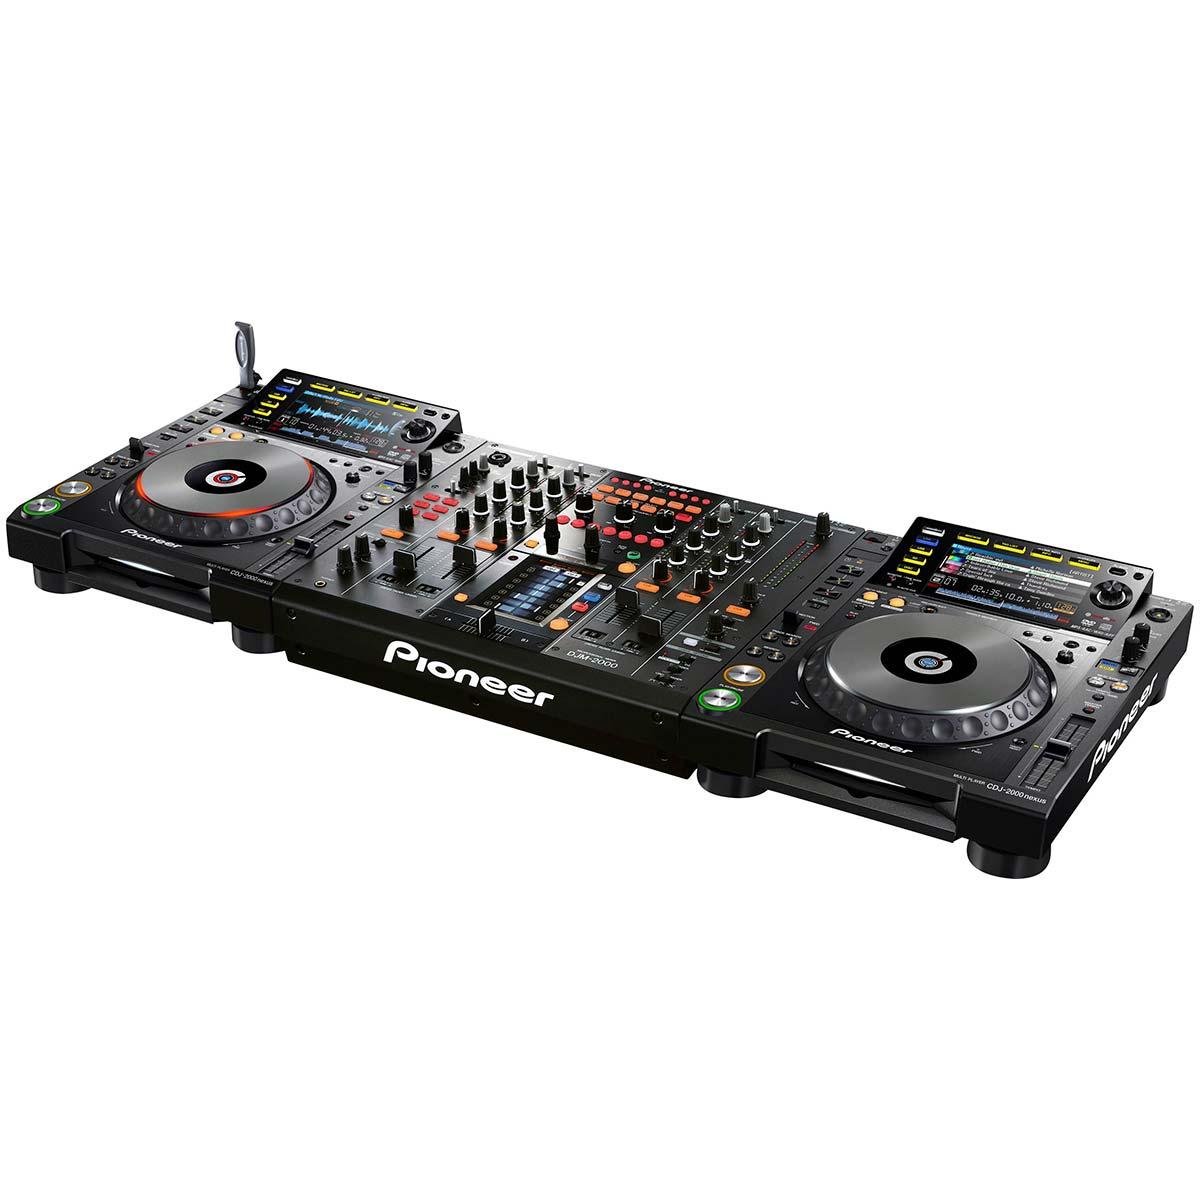 CDJ2000NXS - CDJ Player c/ USB CDJ 2000 NXS Preto - Pioneer